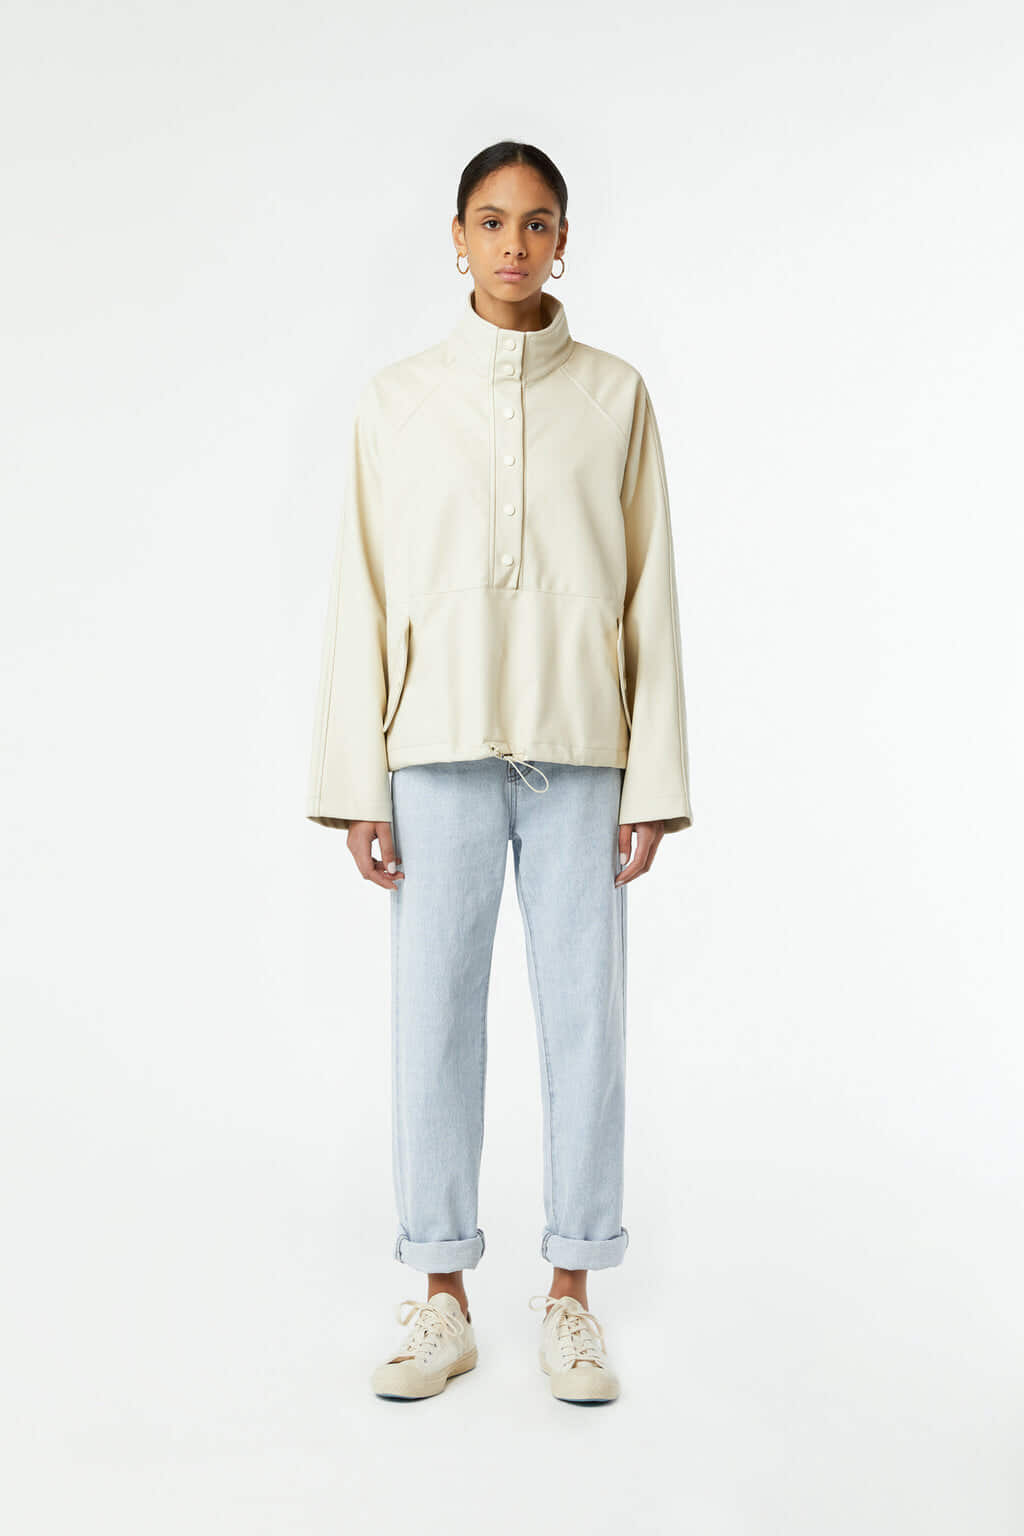 Jacket K001 Cream 2